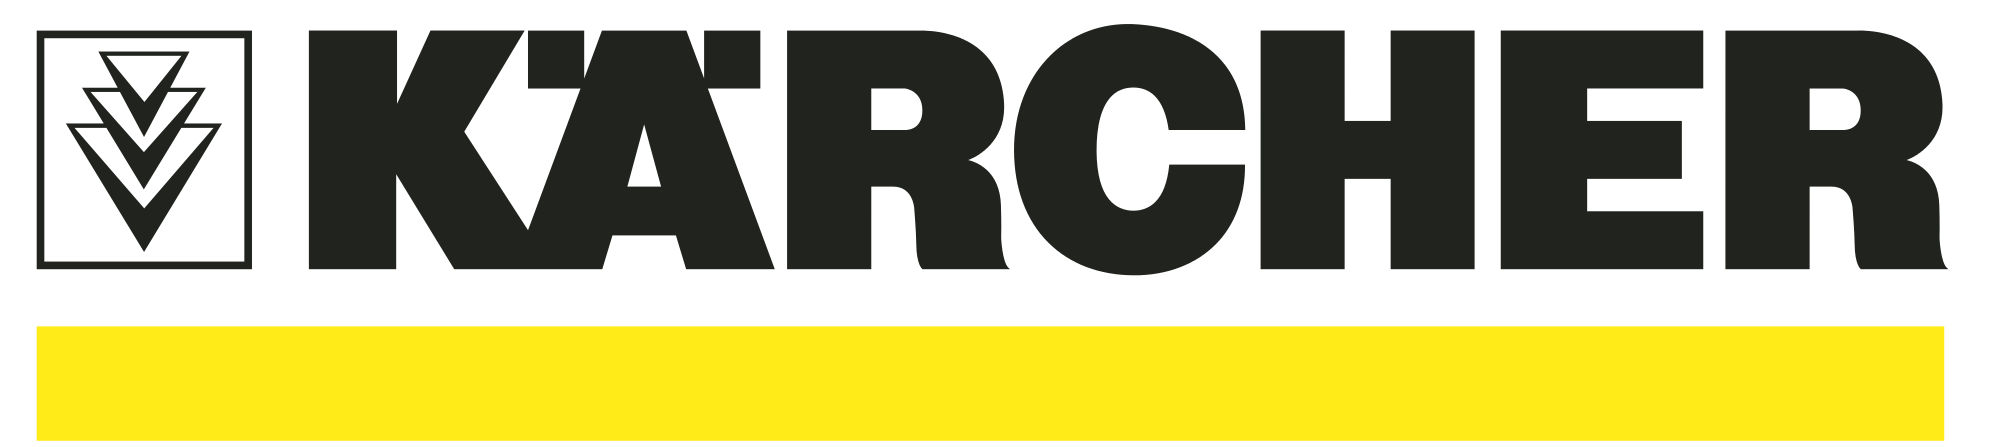 KÄRCHER_logo[1].png